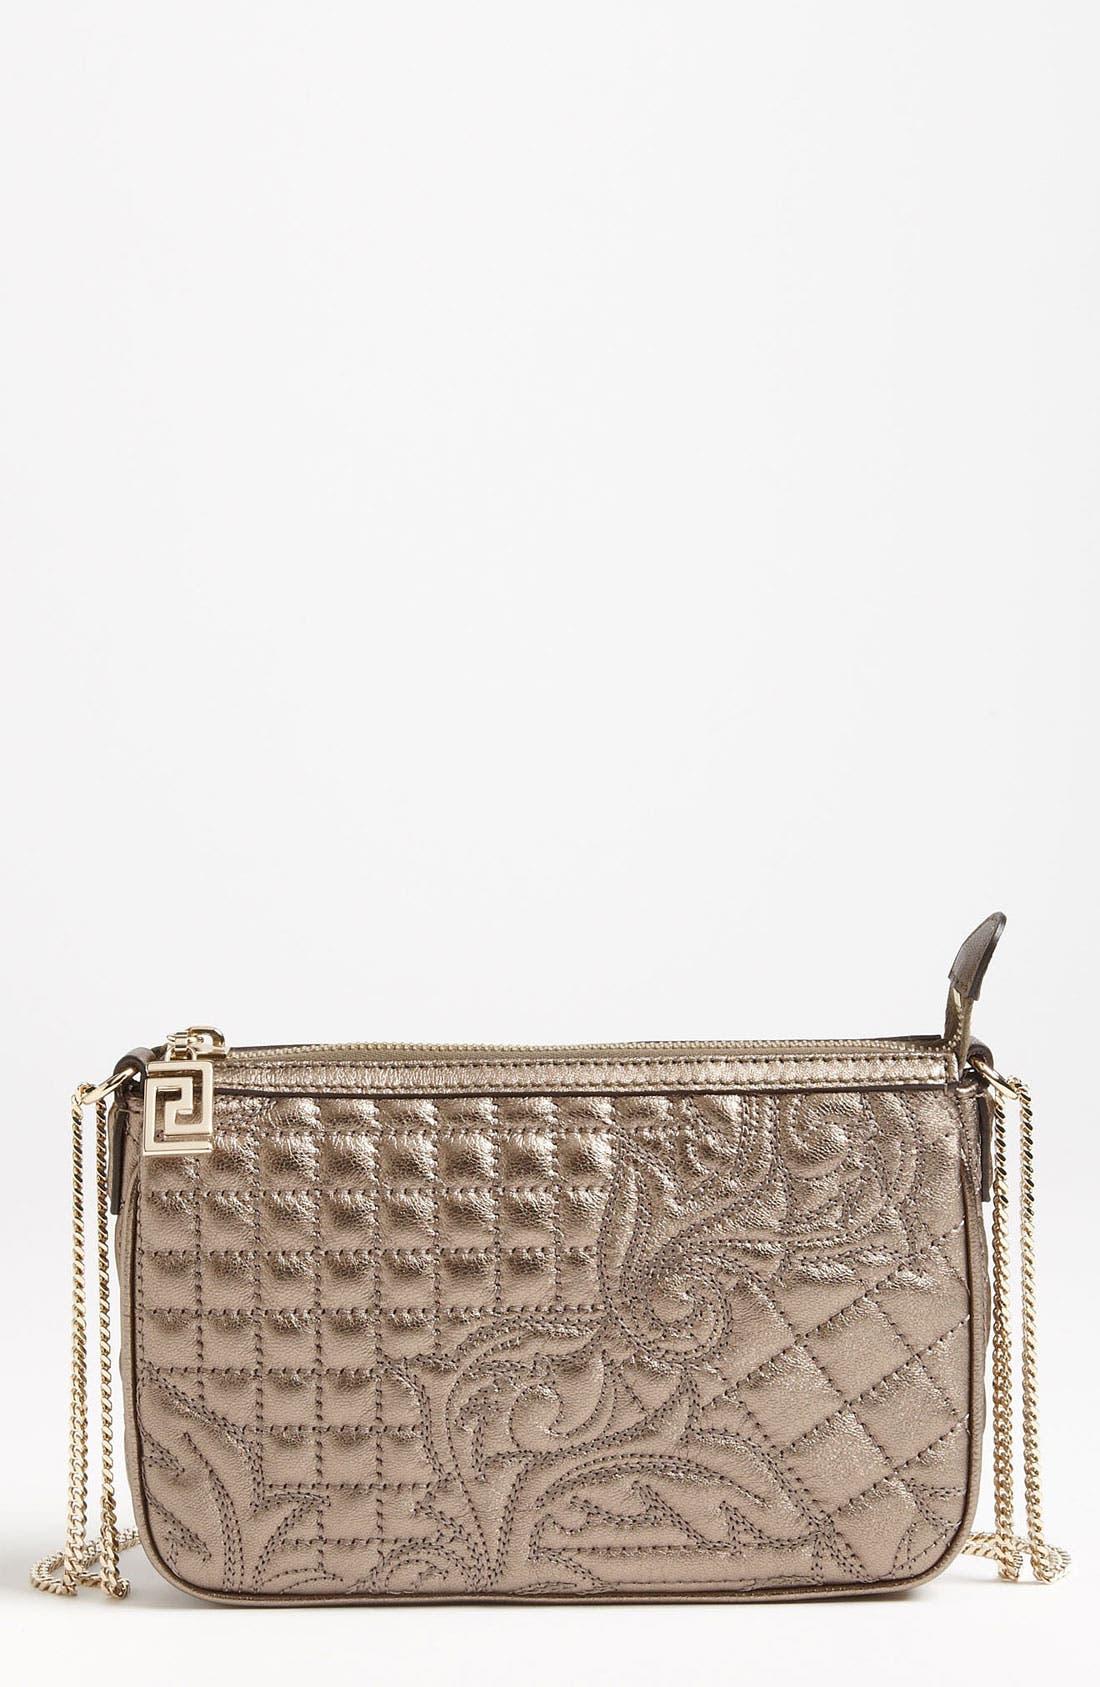 Main Image - Versace 'Vanitas' Leather Crossbody Pouchette